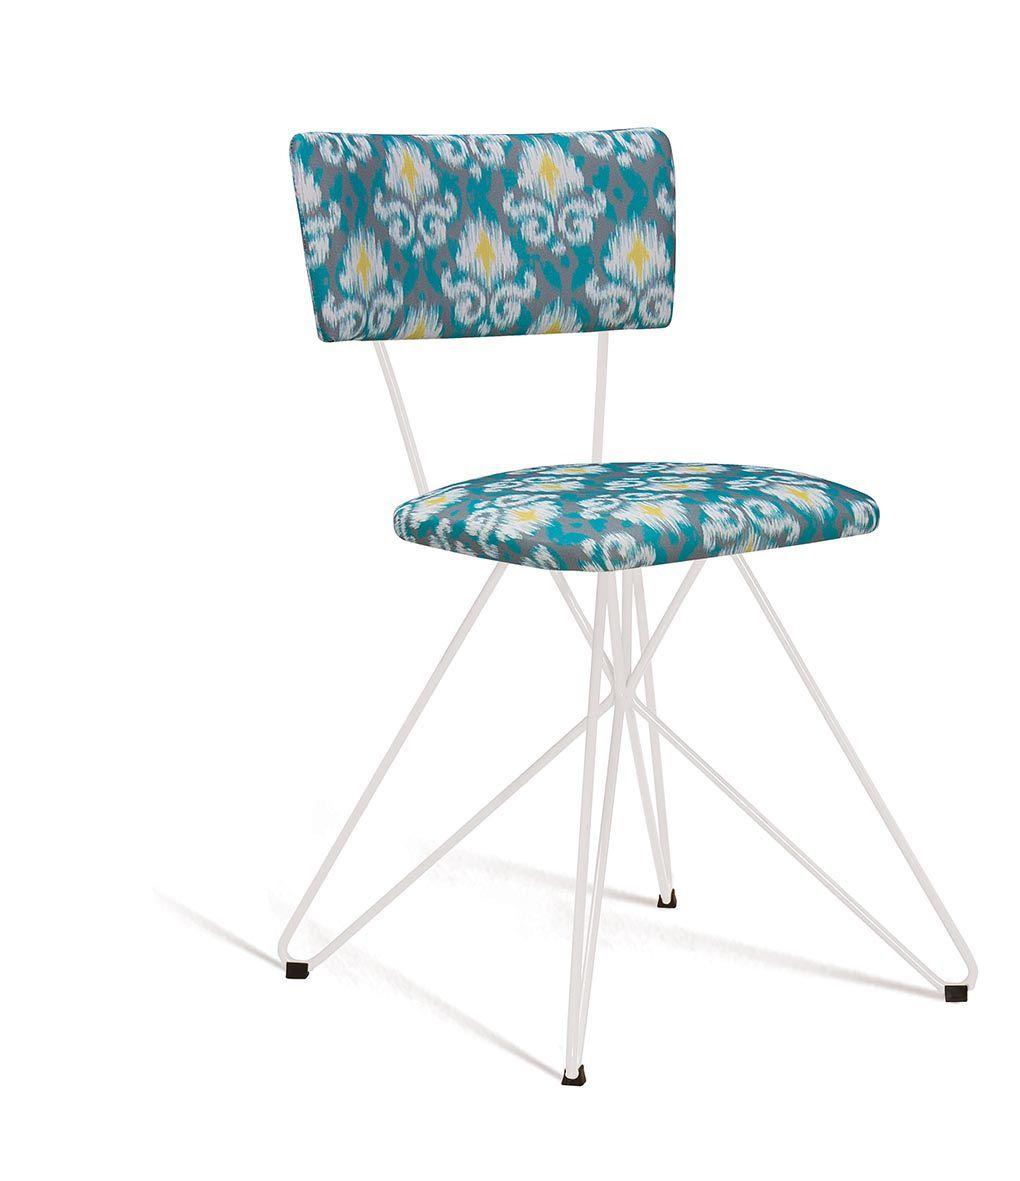 Cadeira Butterfly Estofada Cinza verde DAF